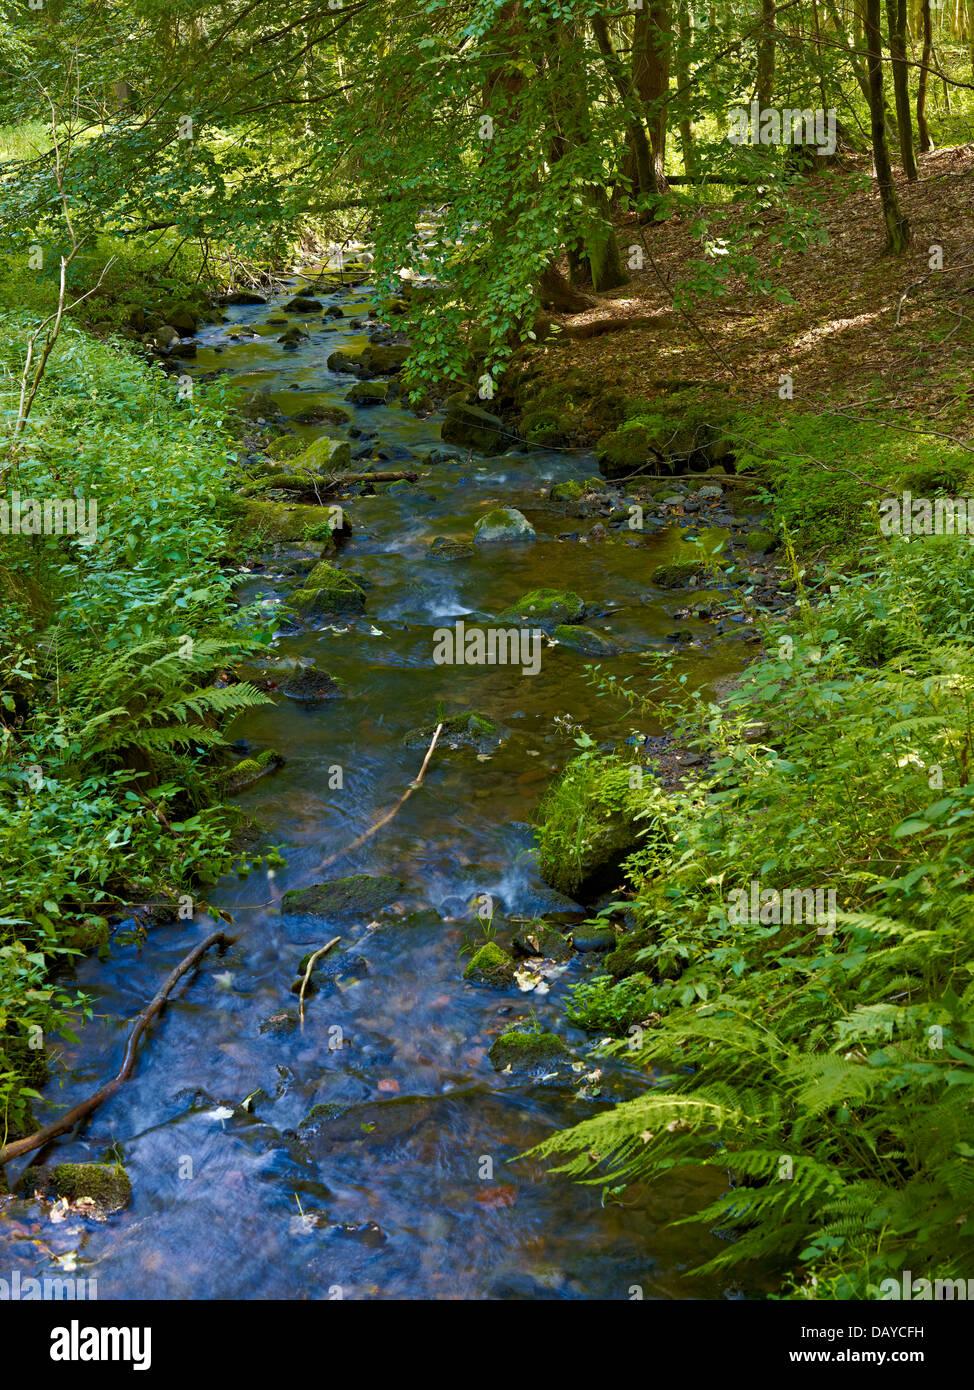 Fluss-Behälters in Biosphere Reserve Vessertal Thüringer Wald, Thüringen, Deutschland Stockbild